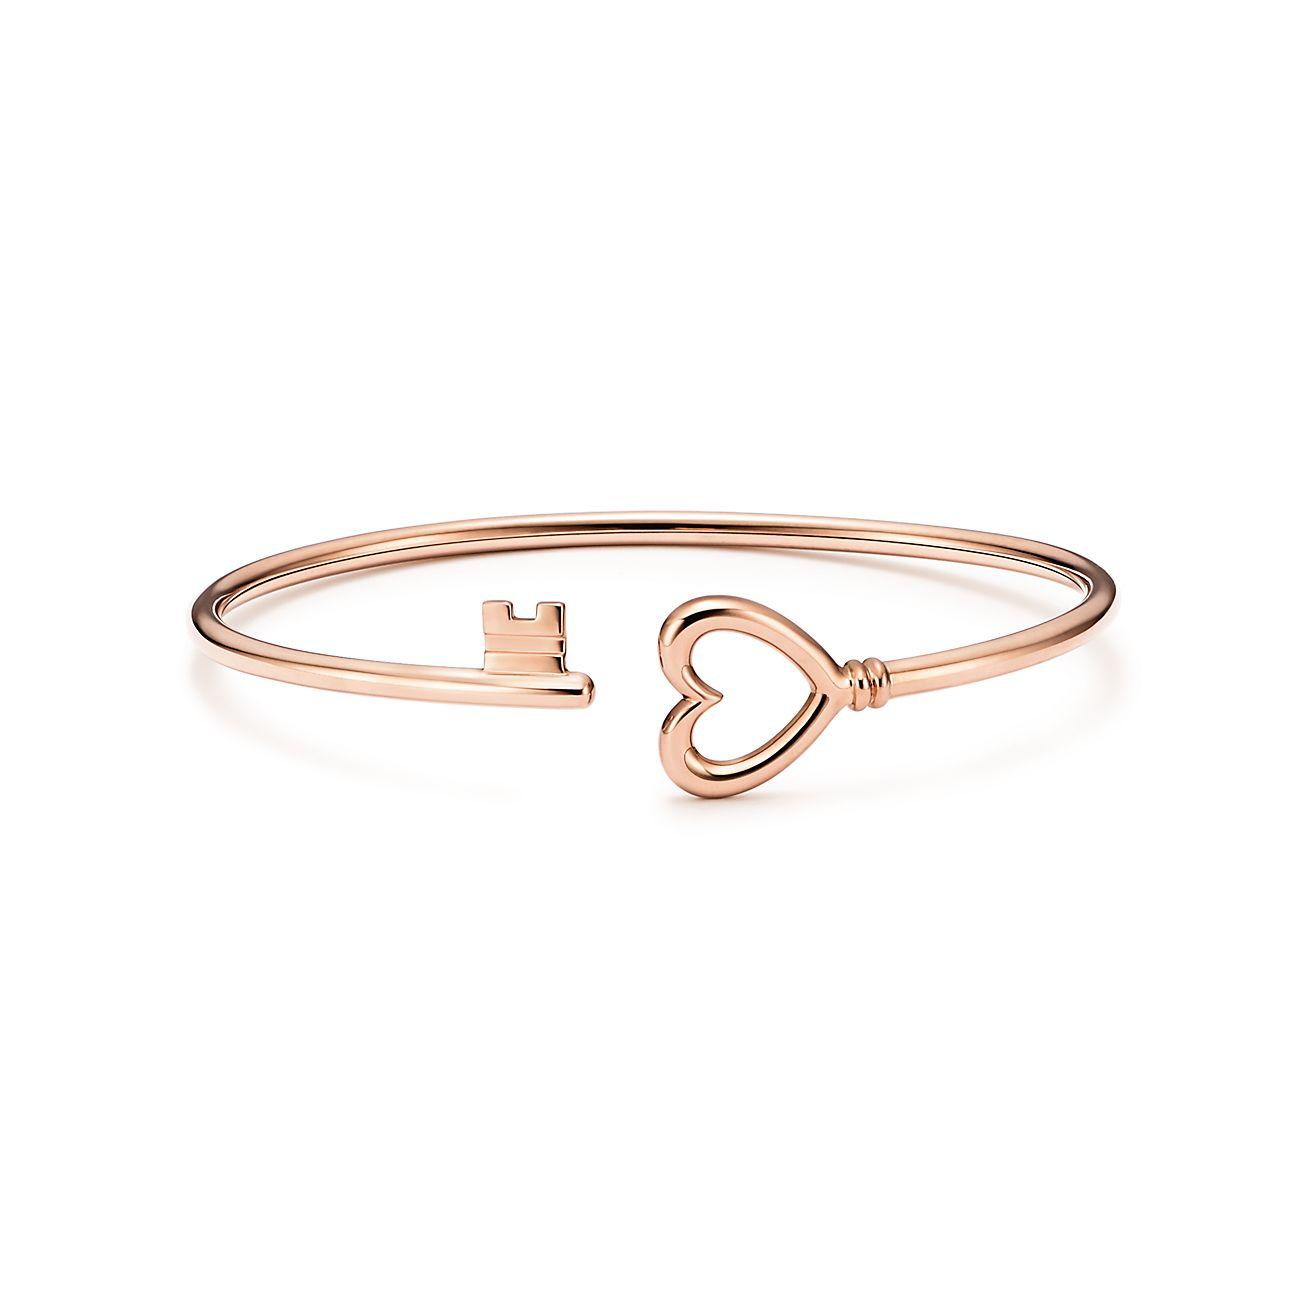 Tiffany Hearts bracelet in platinum with diamonds - Size 6.25 IN Tiffany & Co.